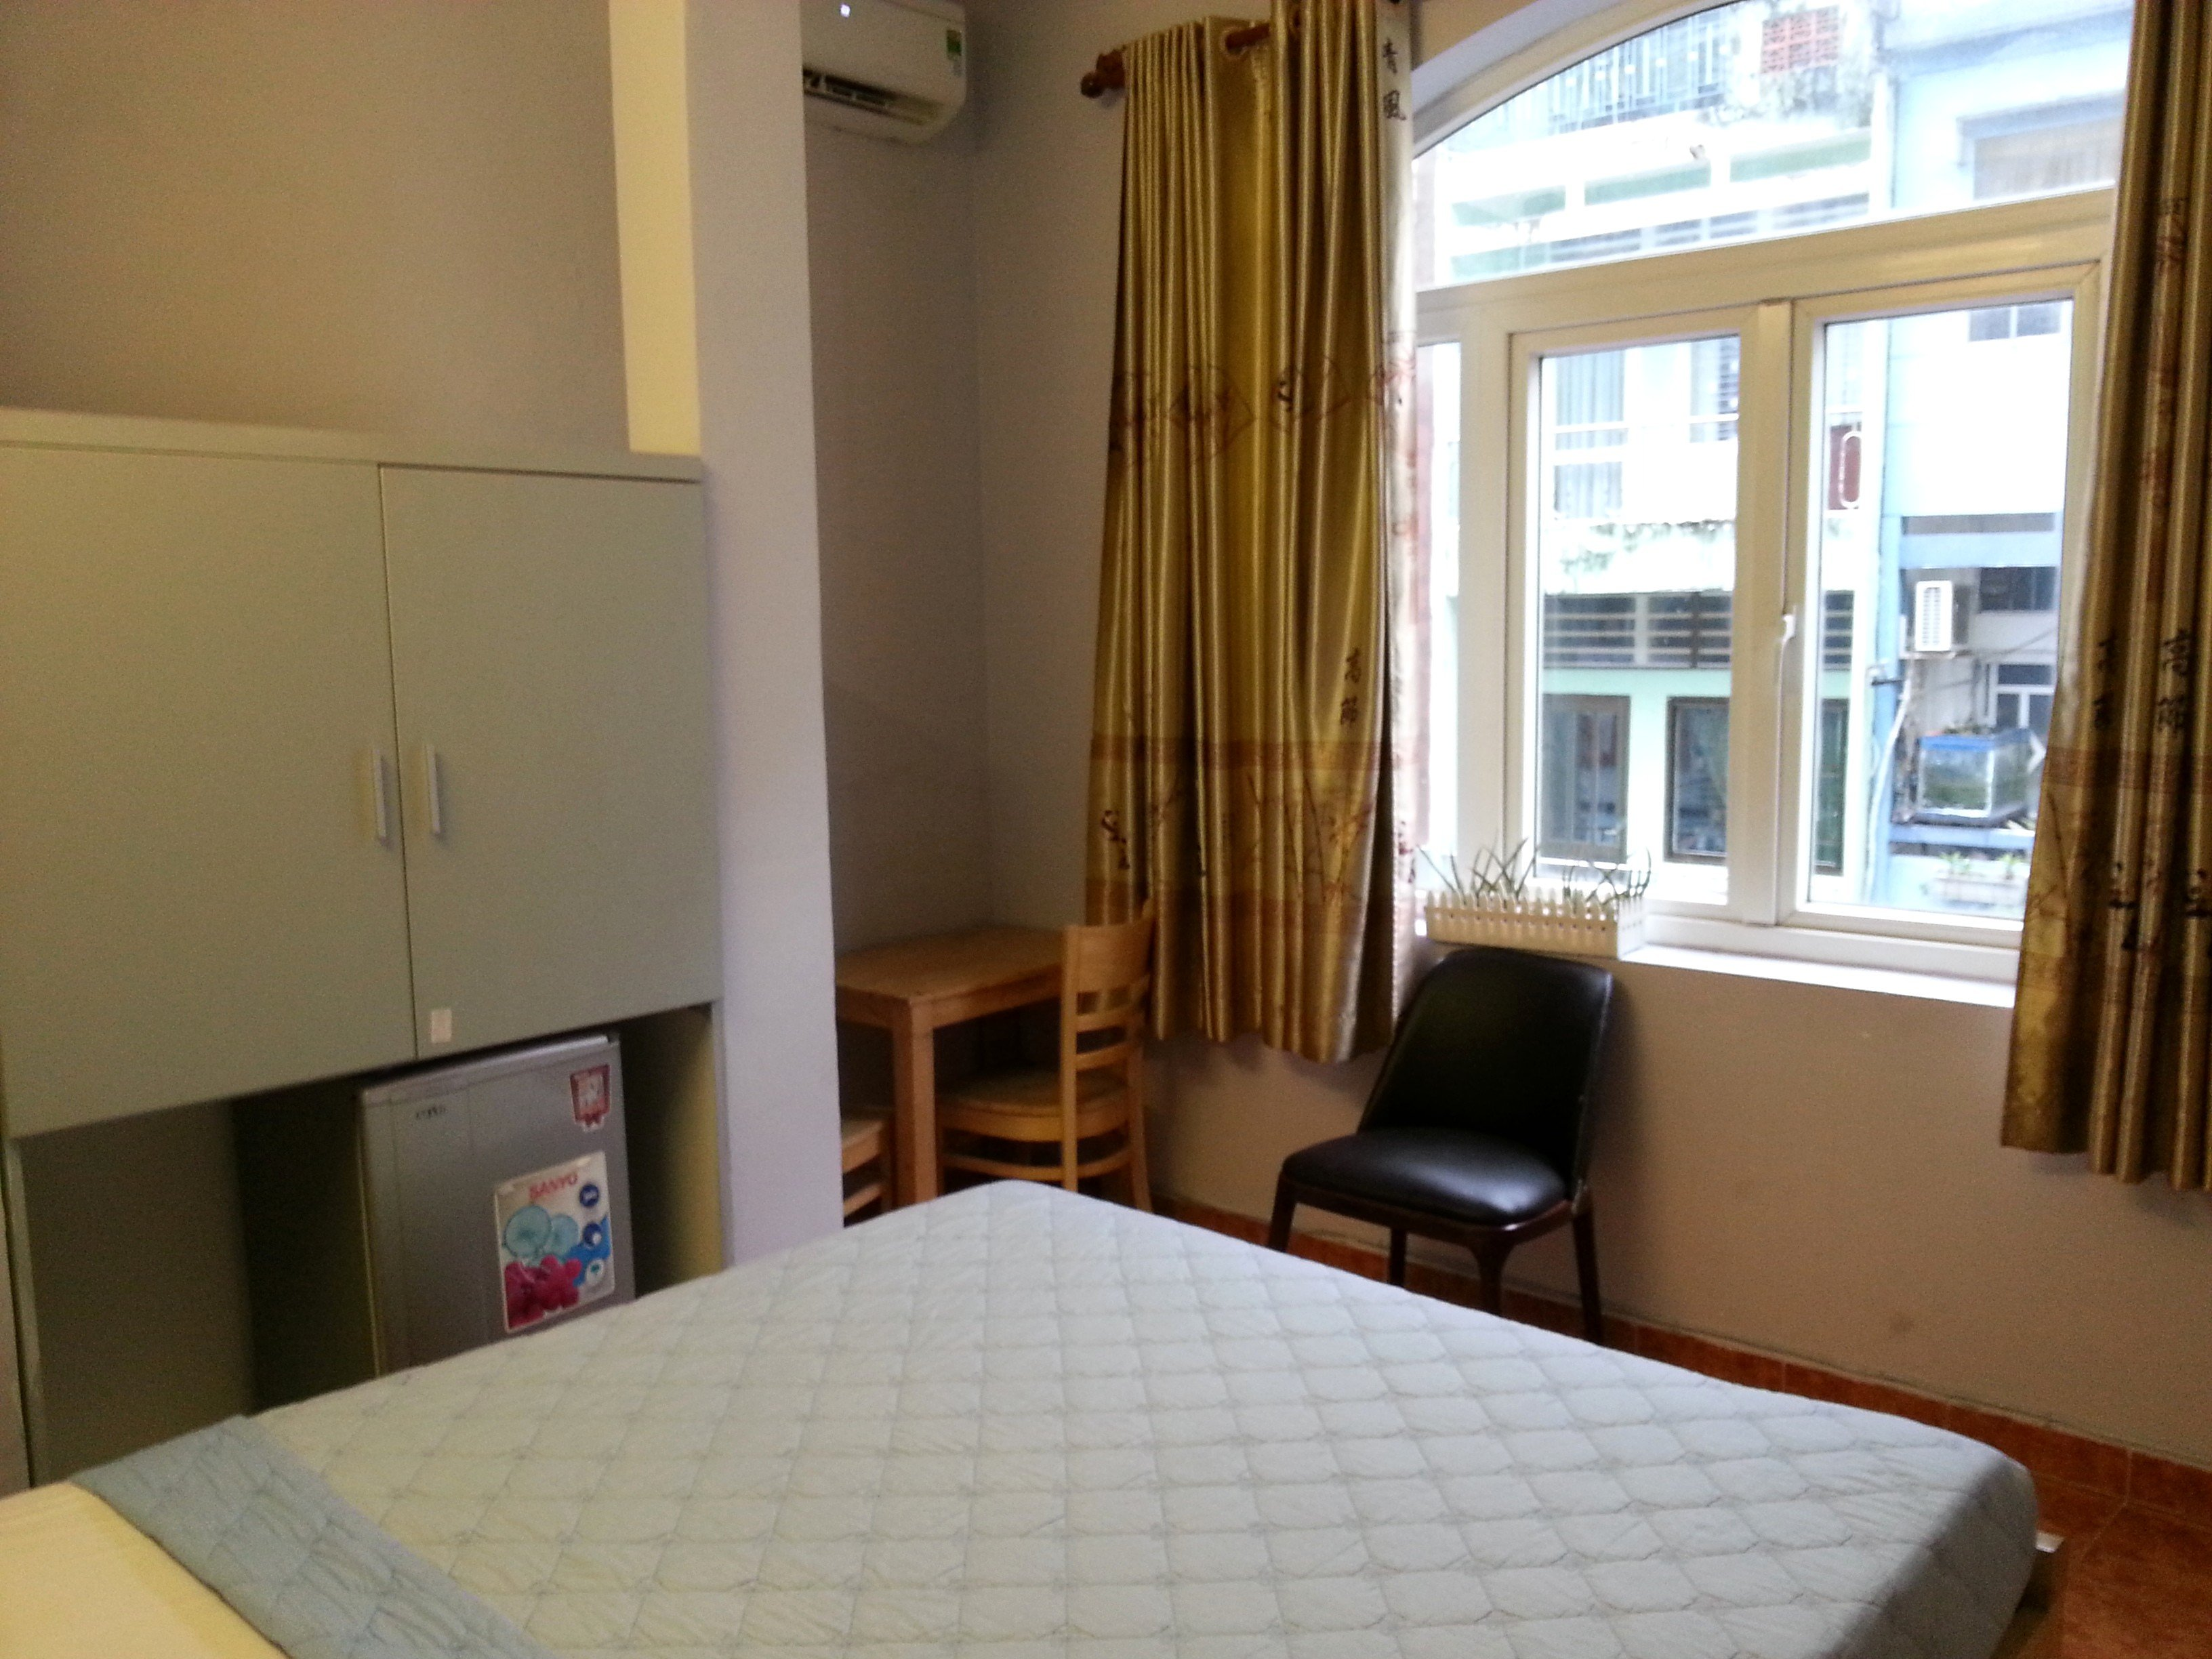 Bedroom at Ha Vy Hotel